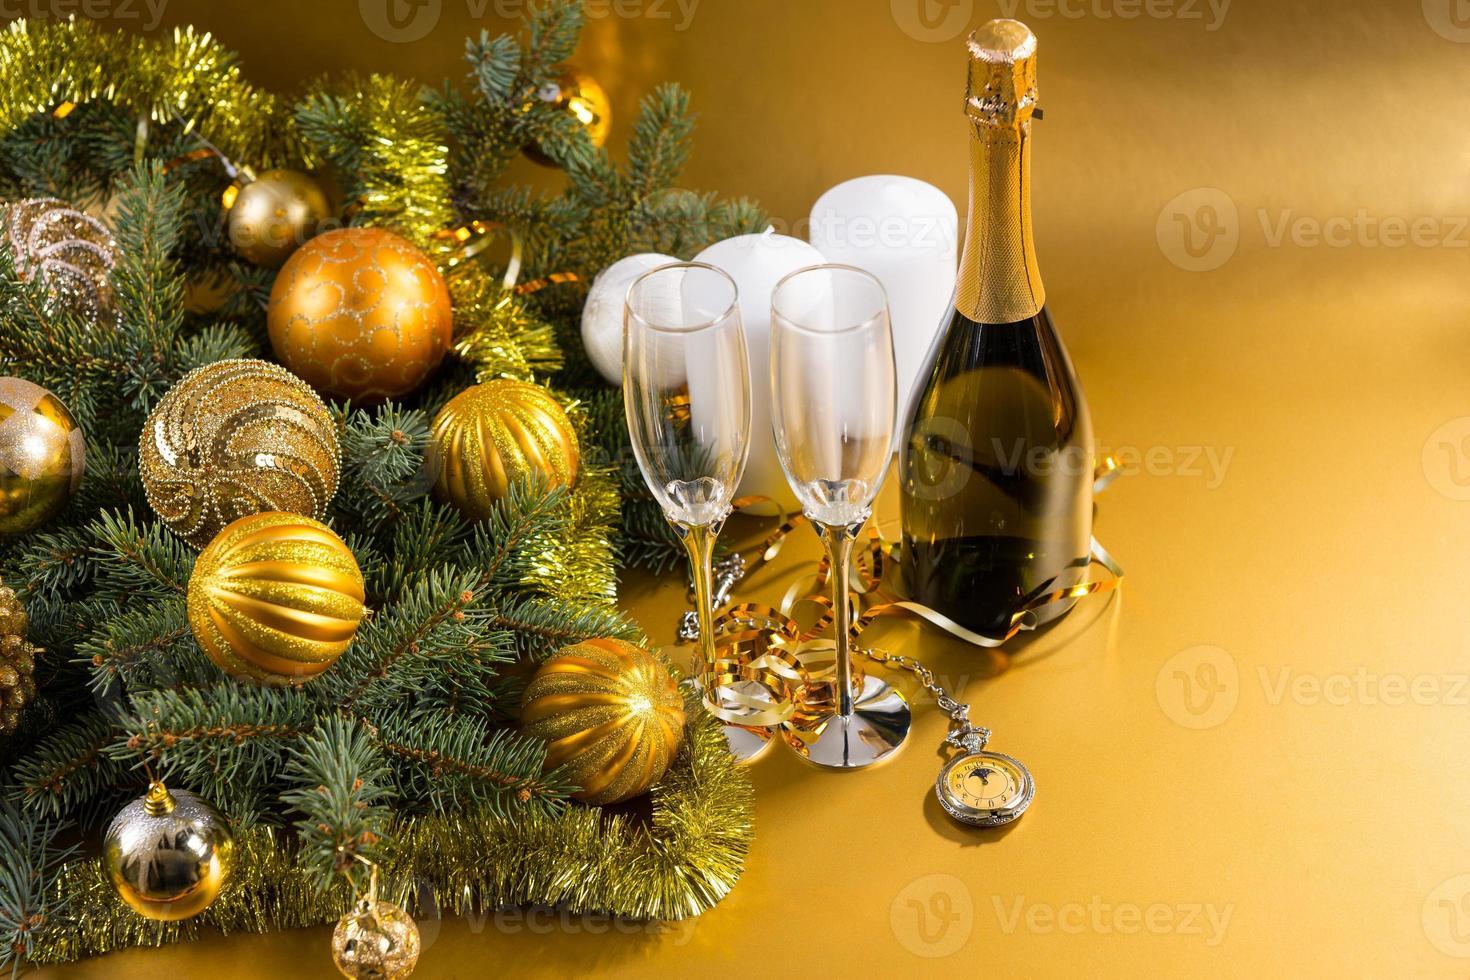 reloj de bolsillo champagne y decoraciones festivas foto